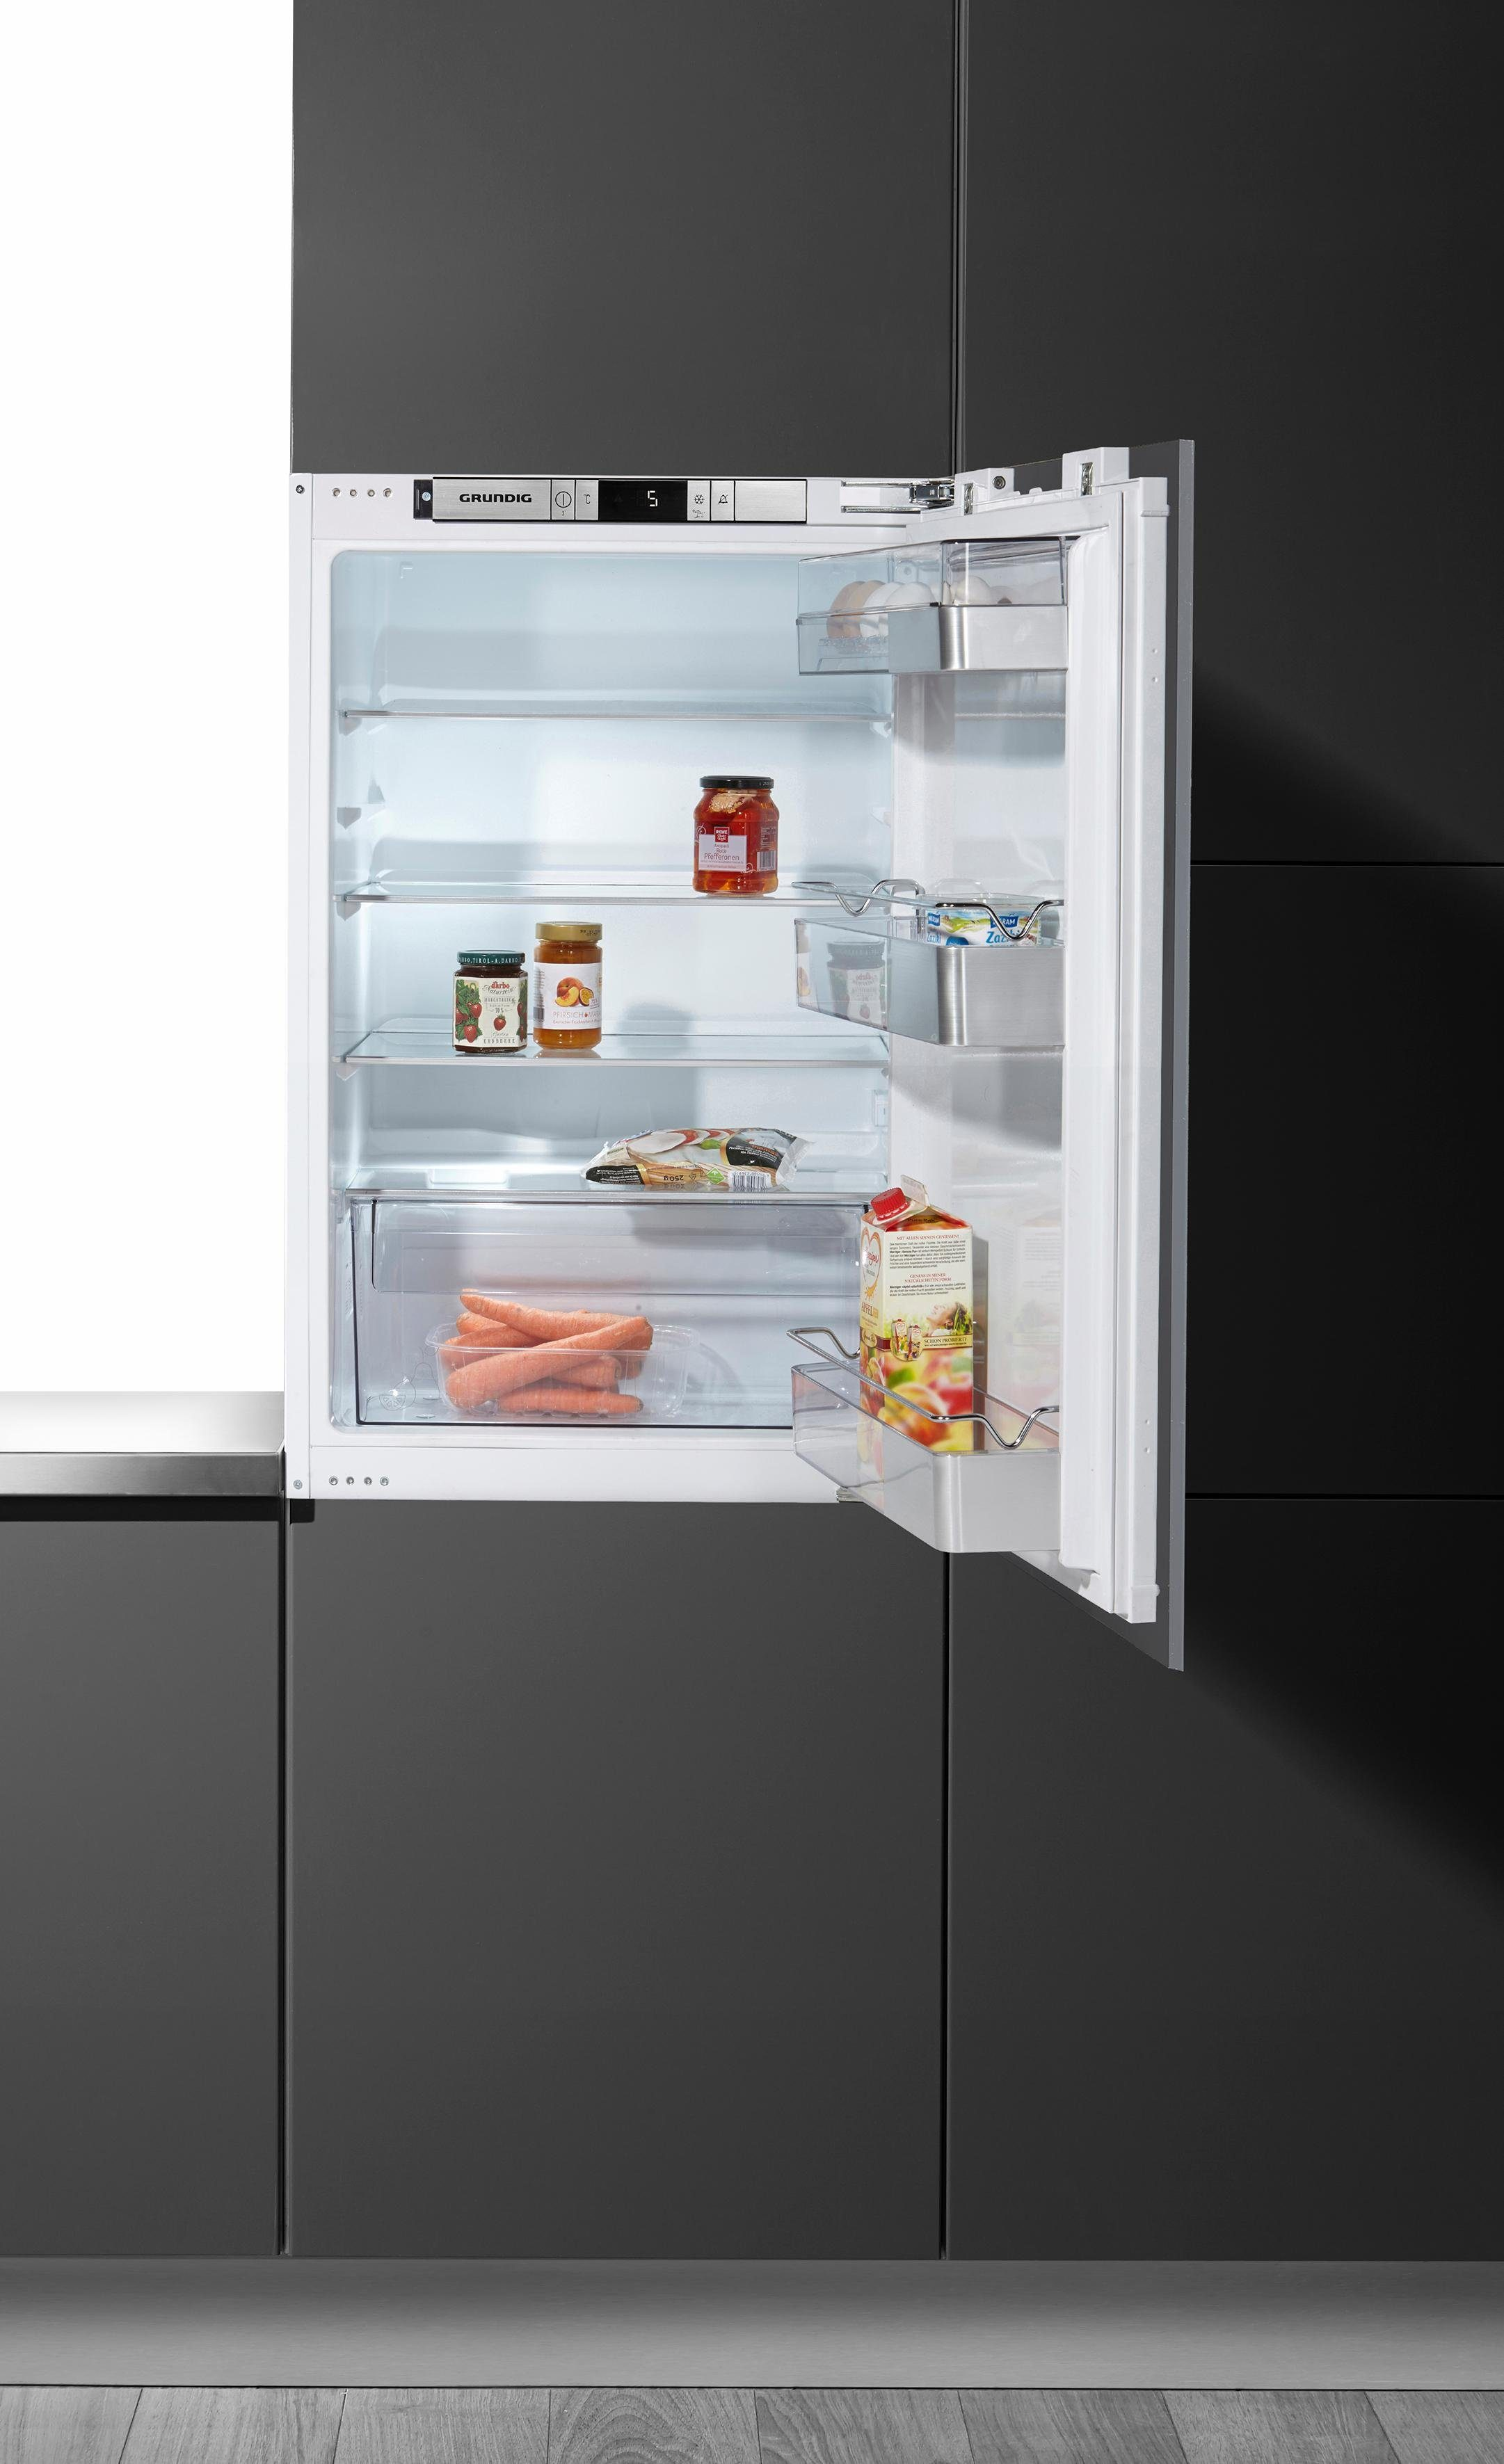 Grundig Einbaukühlschrank GTMI 10120, 87,6 cm hoch, 55,6 cm breit, A++, 87,6 cm, integrierbar